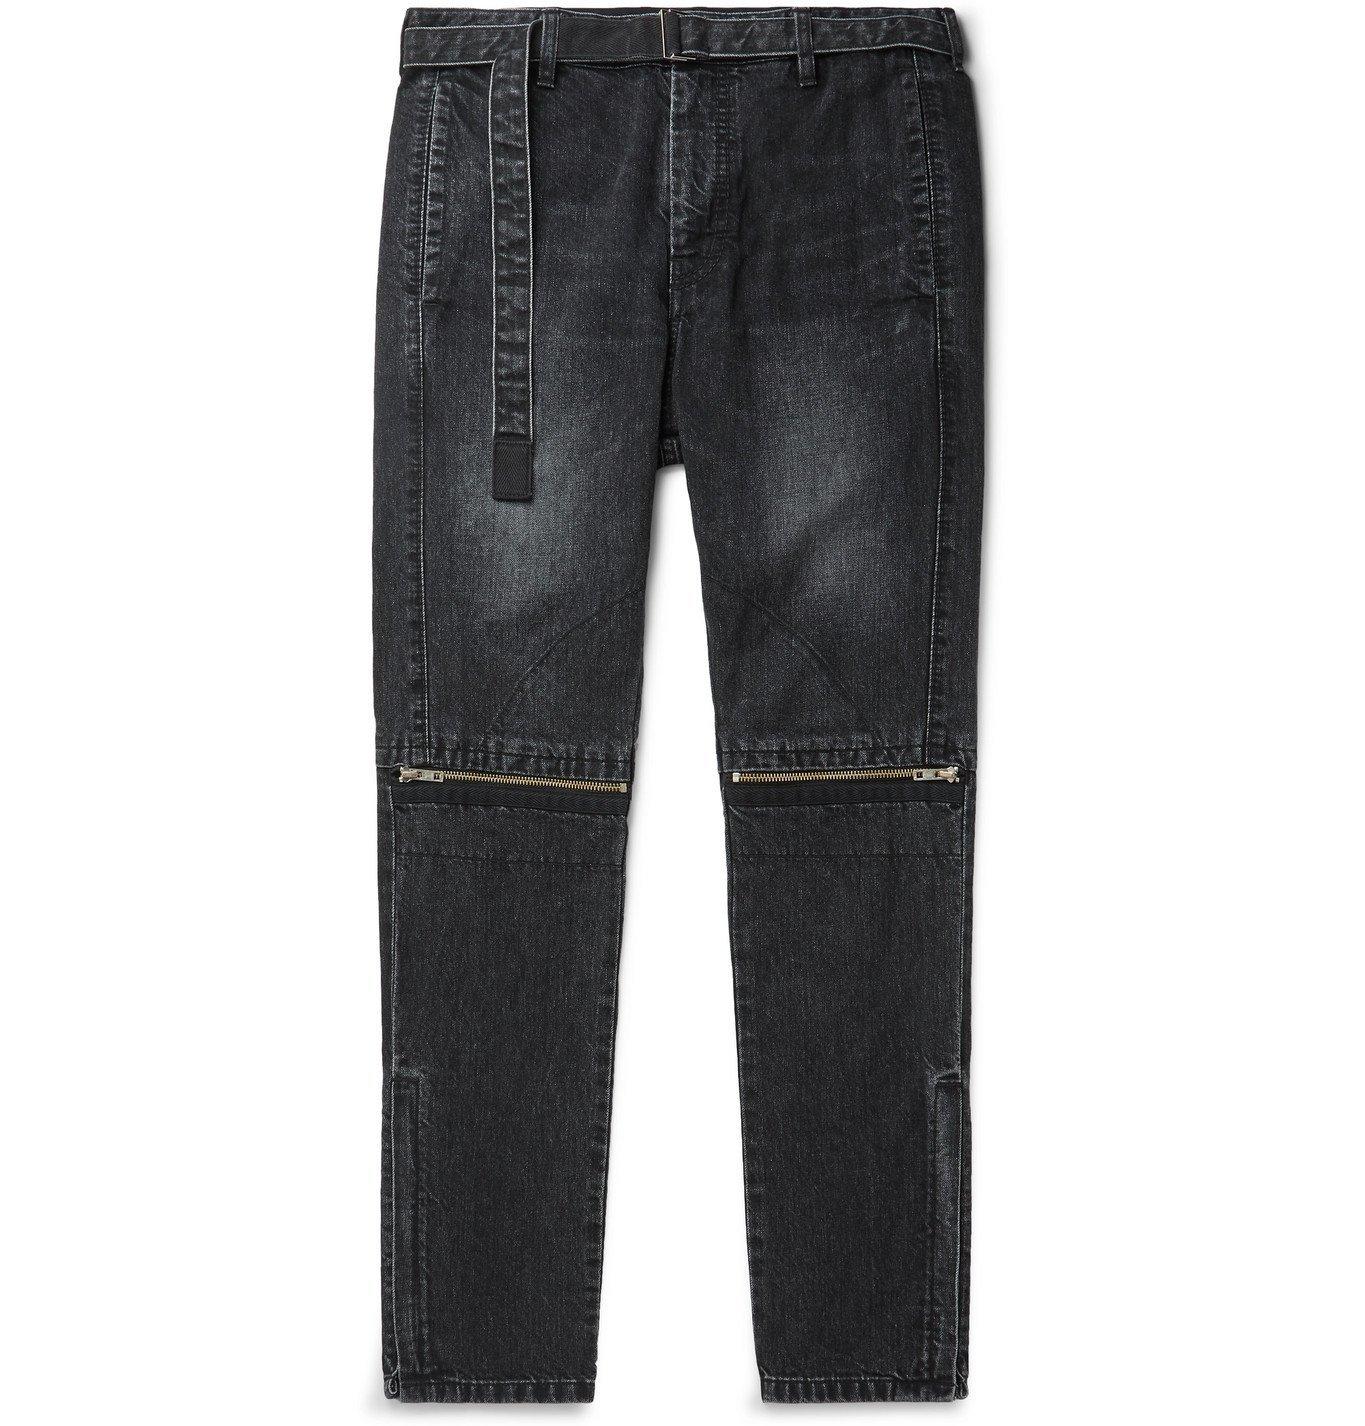 Sacai - Slim-Fit Belted Denim Jeans - Black